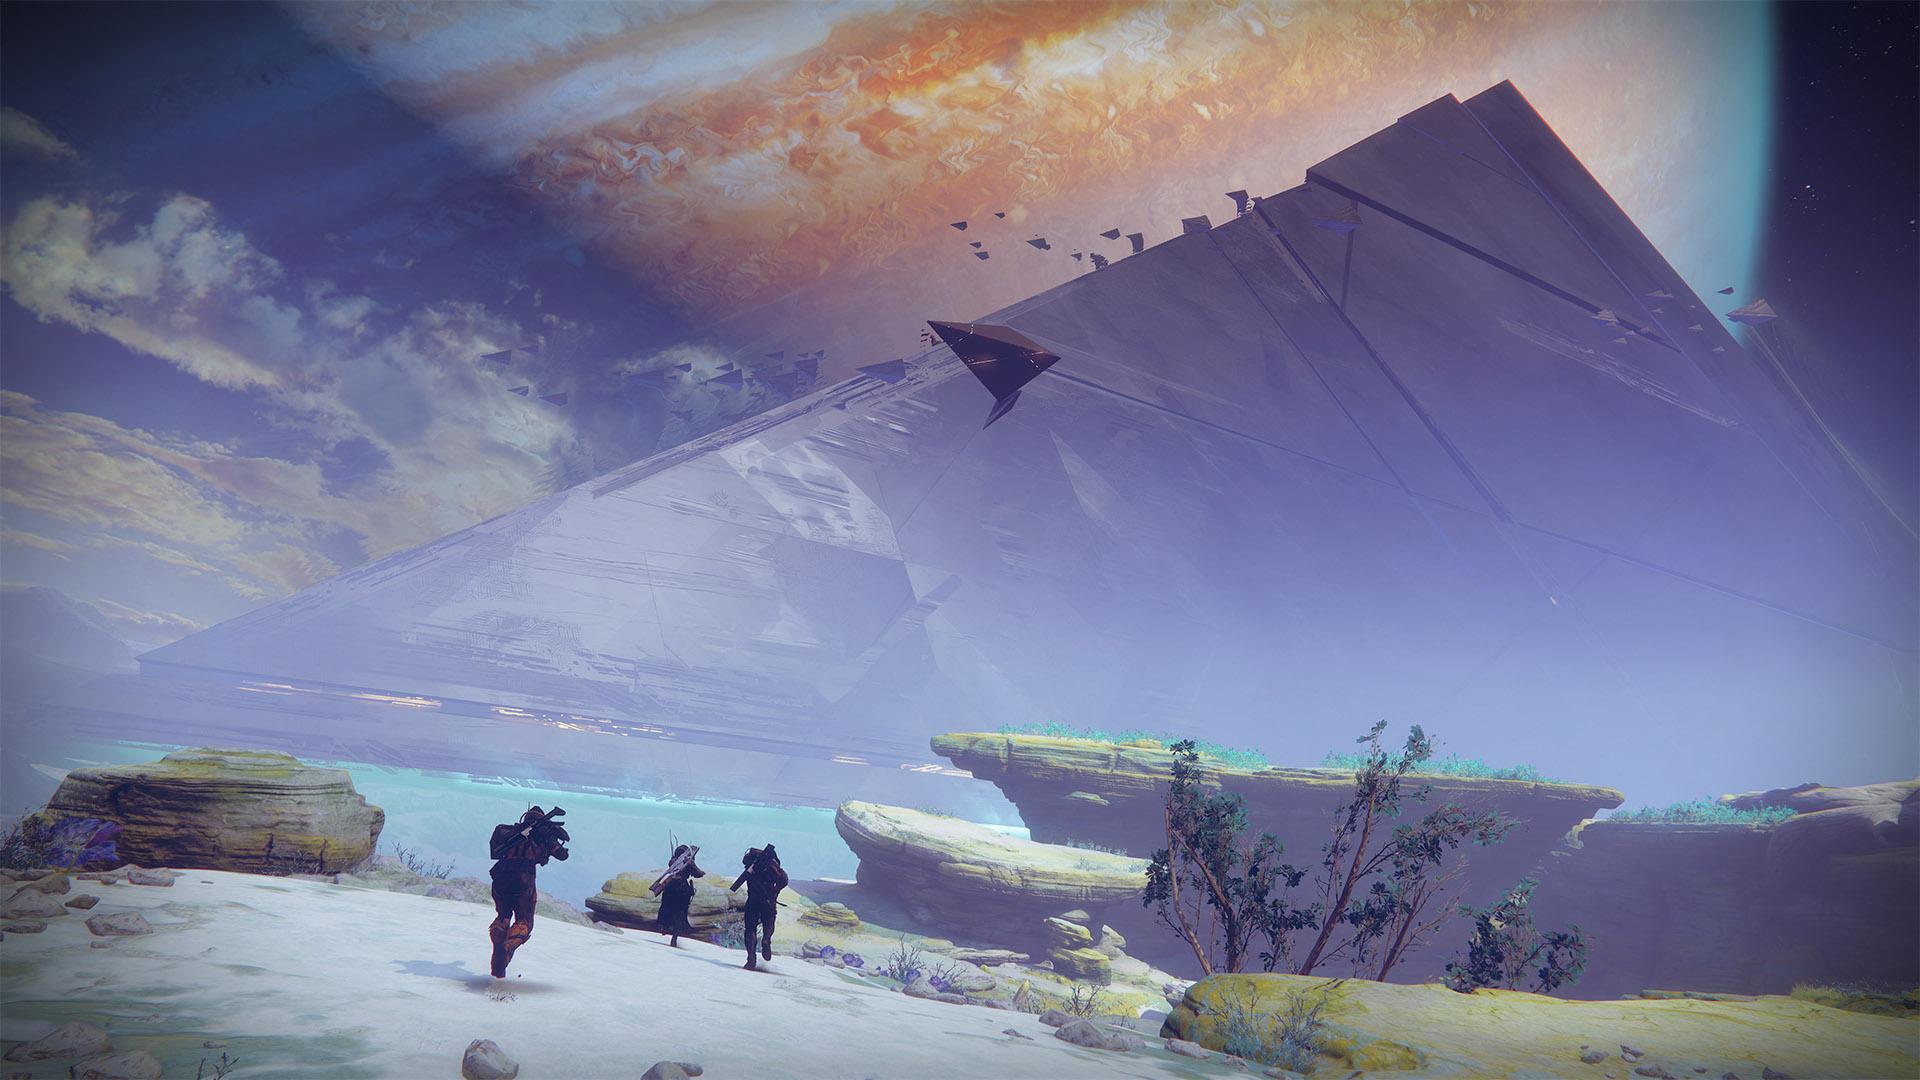 Destiny 2 Season 11 Season of Arrivals